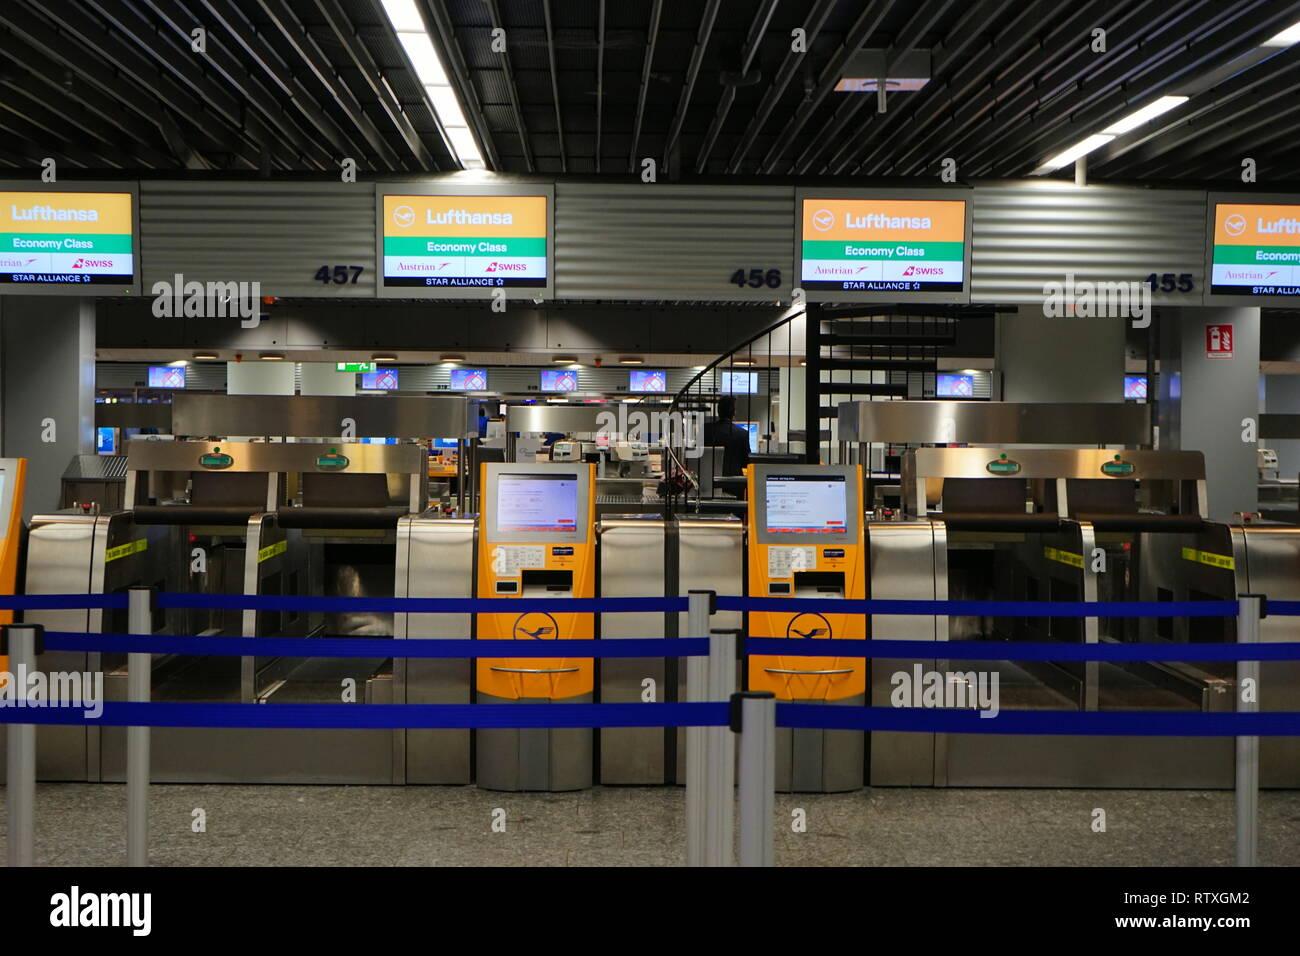 Flughafen, Airport, Frankfurt am Main, Germany - Stock Image